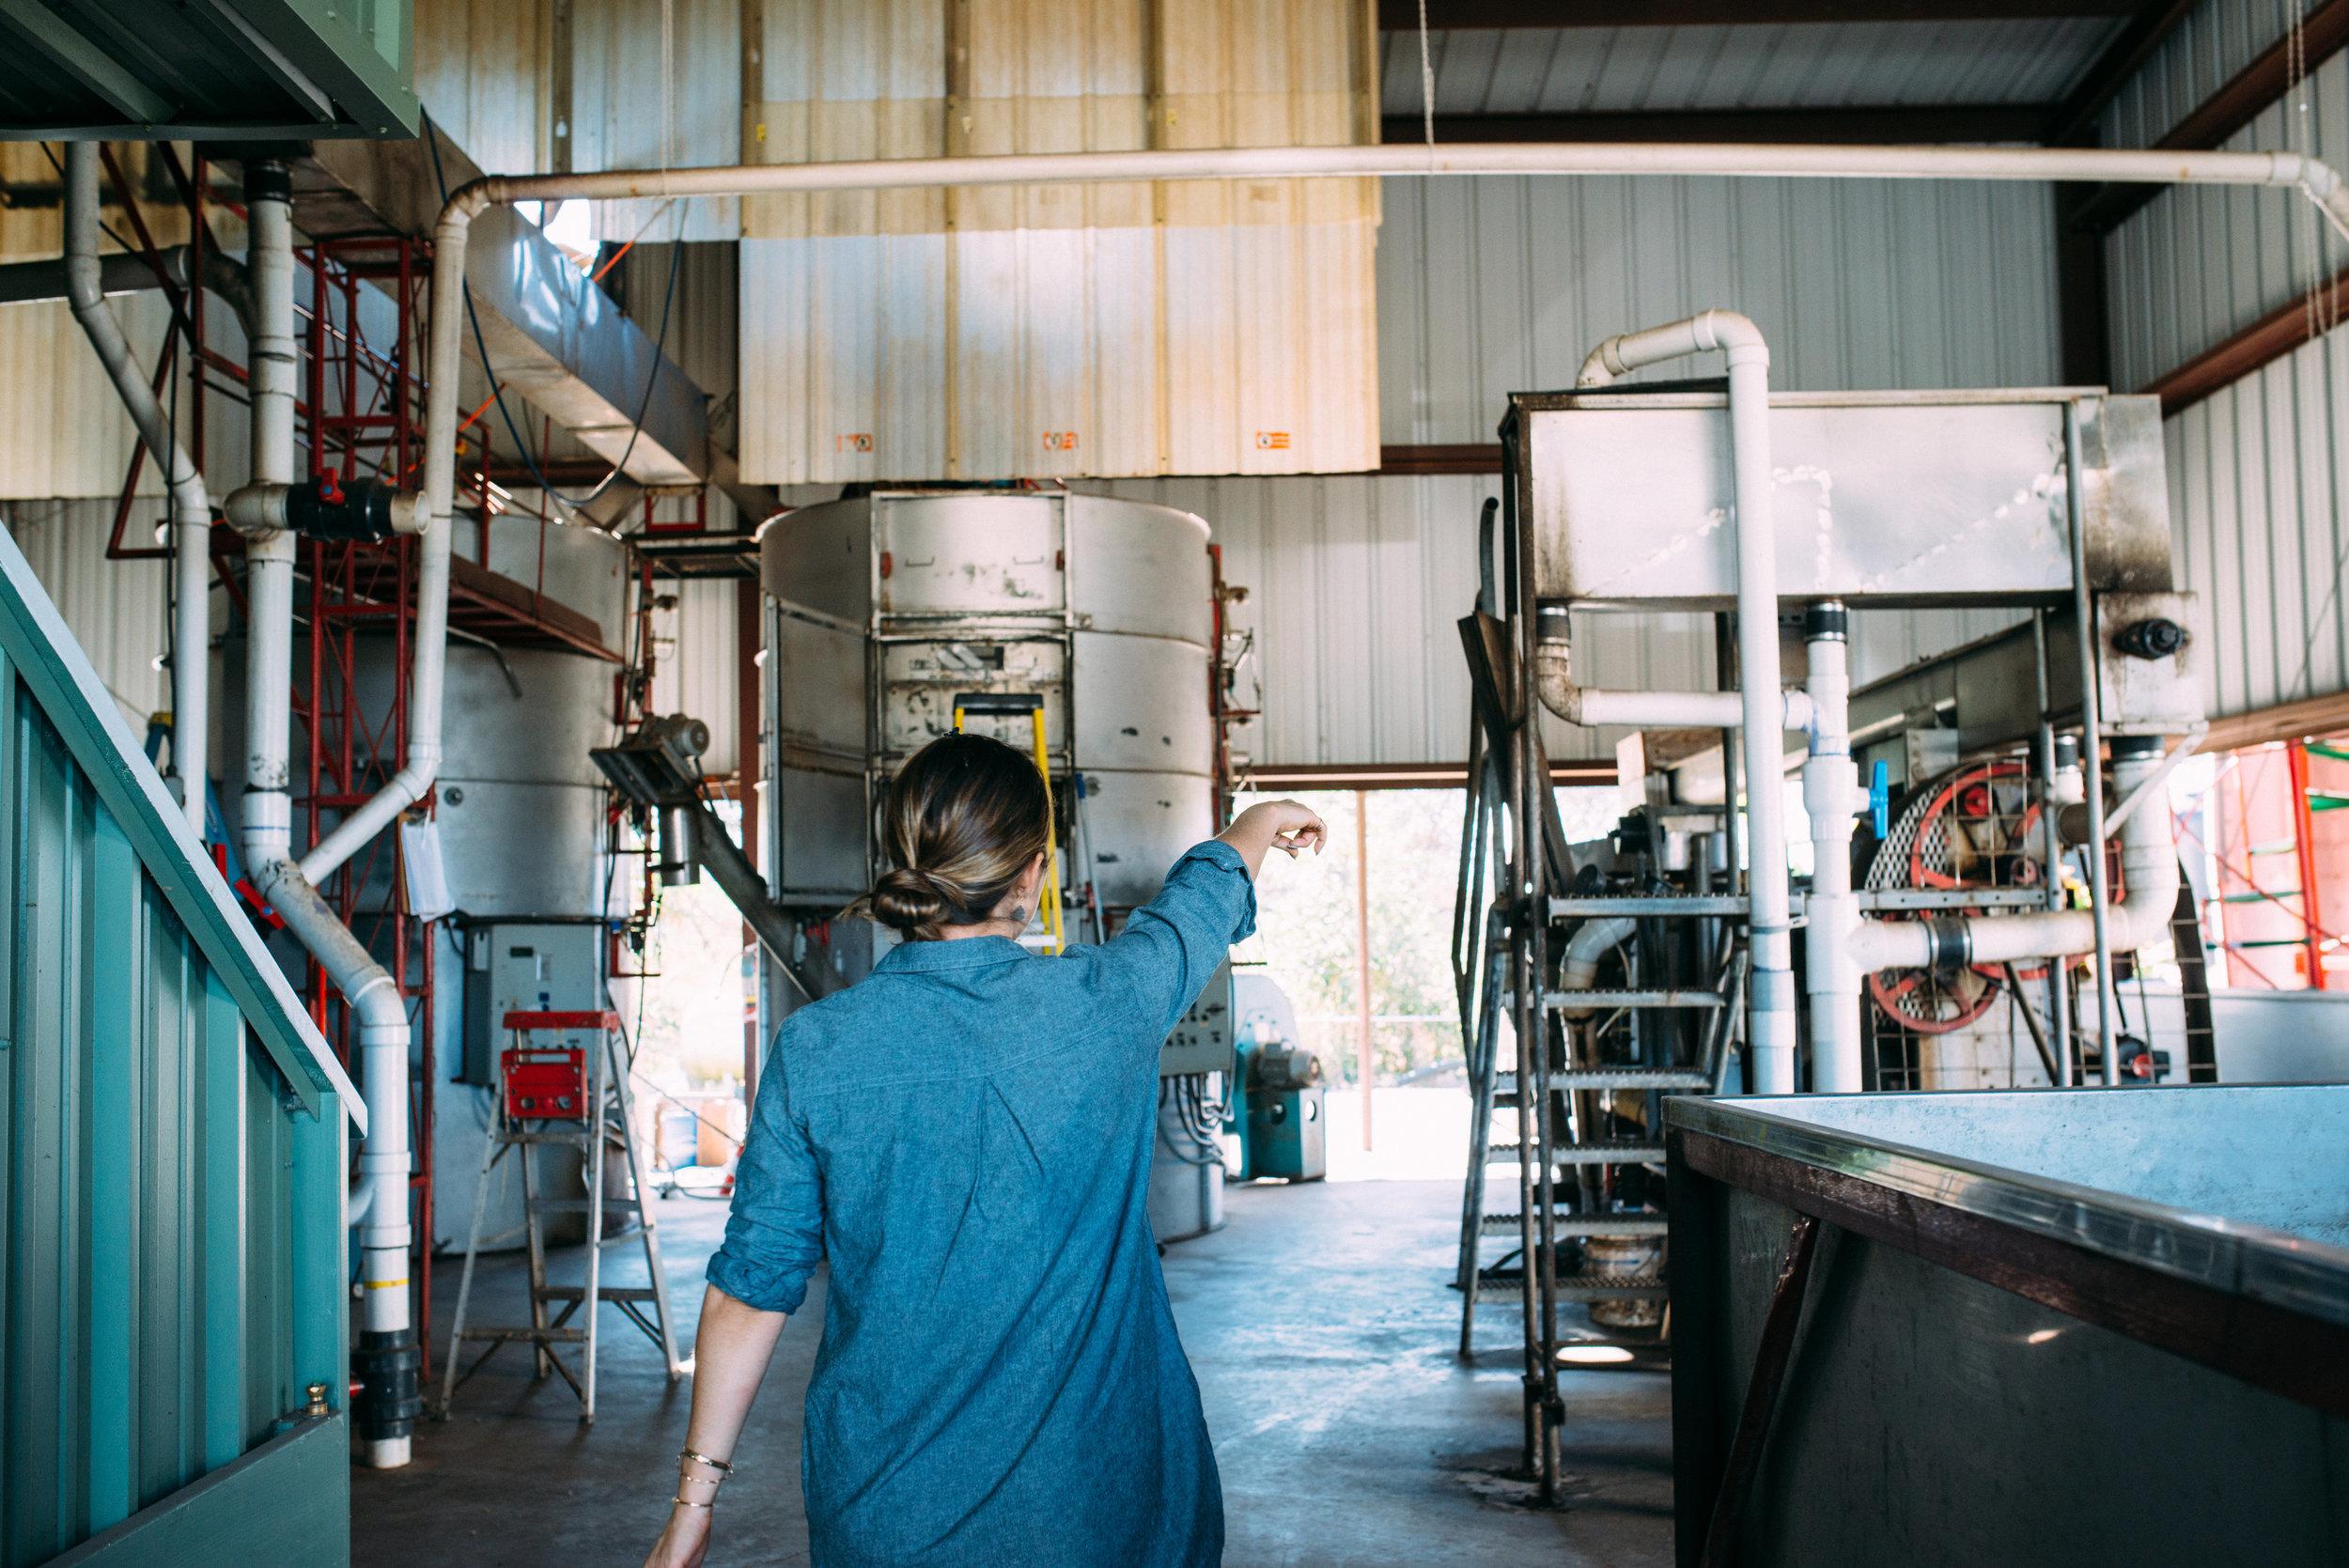 Malia giving a tour of the Kona Coffee & Tea Mill. PHOTO: Blake Wisz